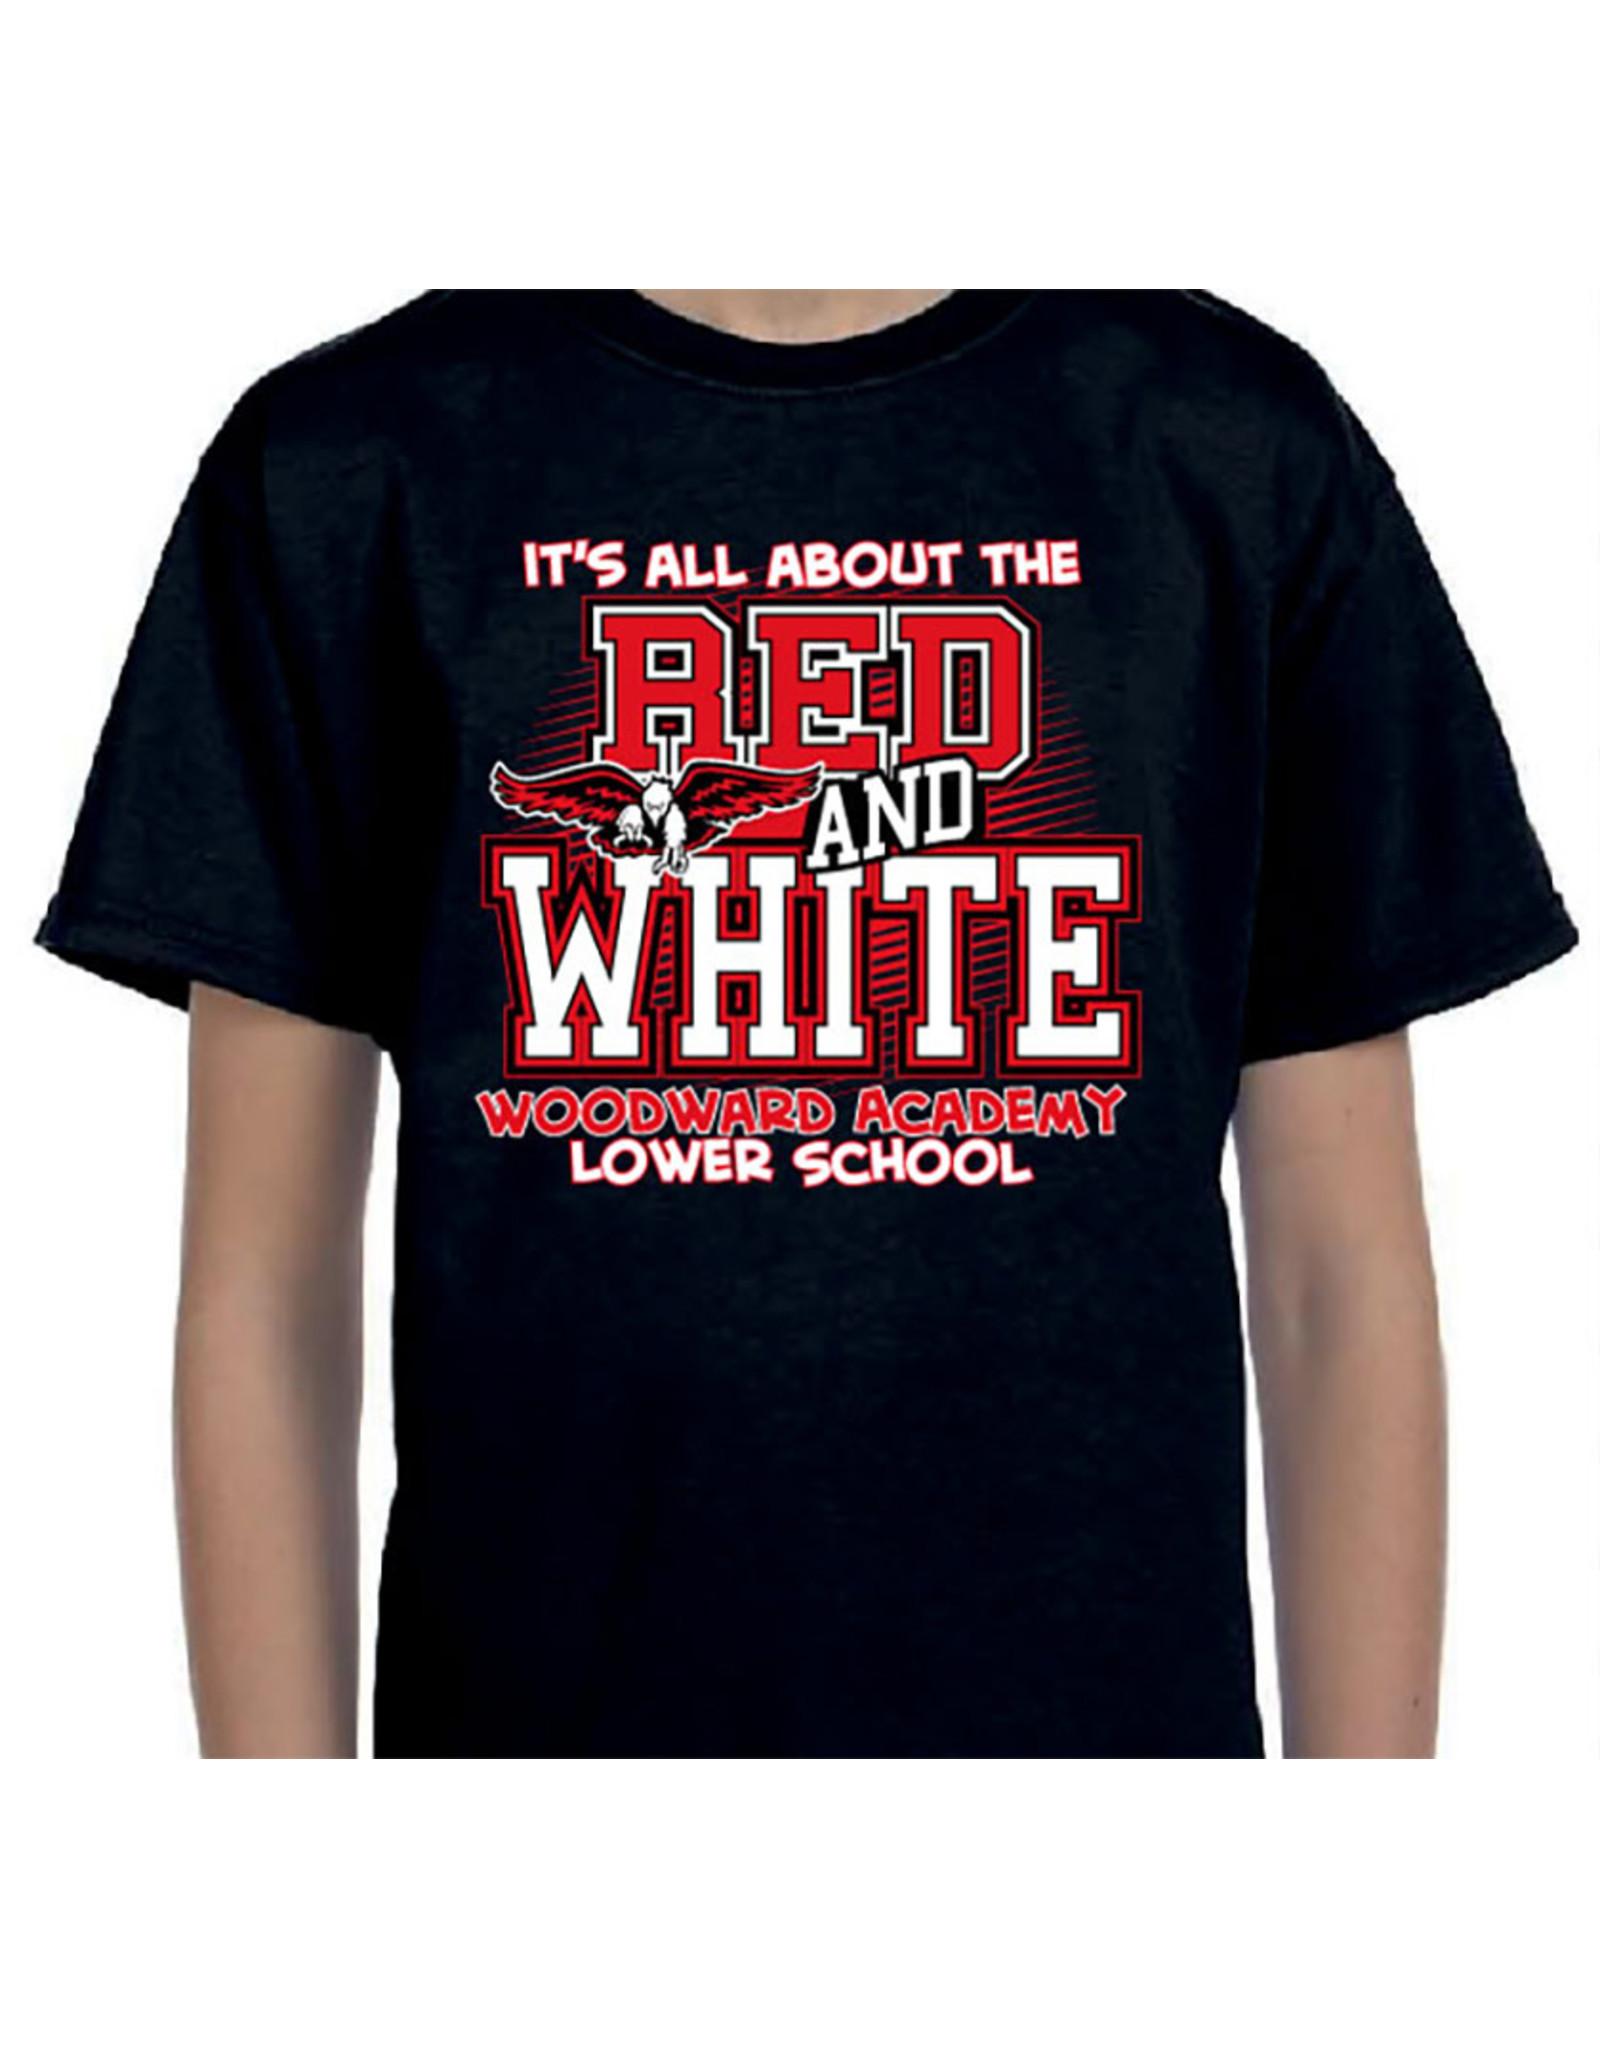 LOWER SCHOOL SPIRIT SHIRT